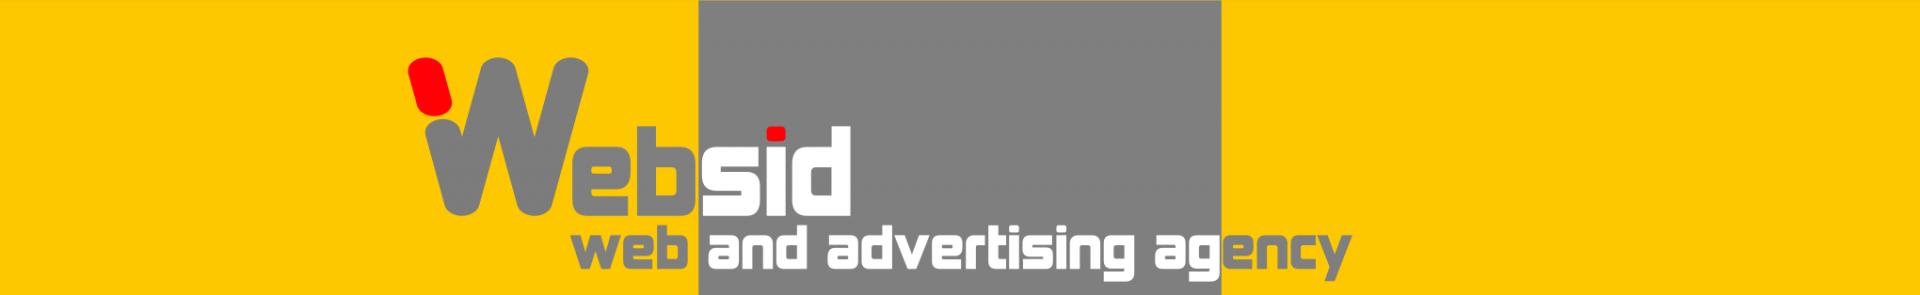 Websid - web and advertising agency